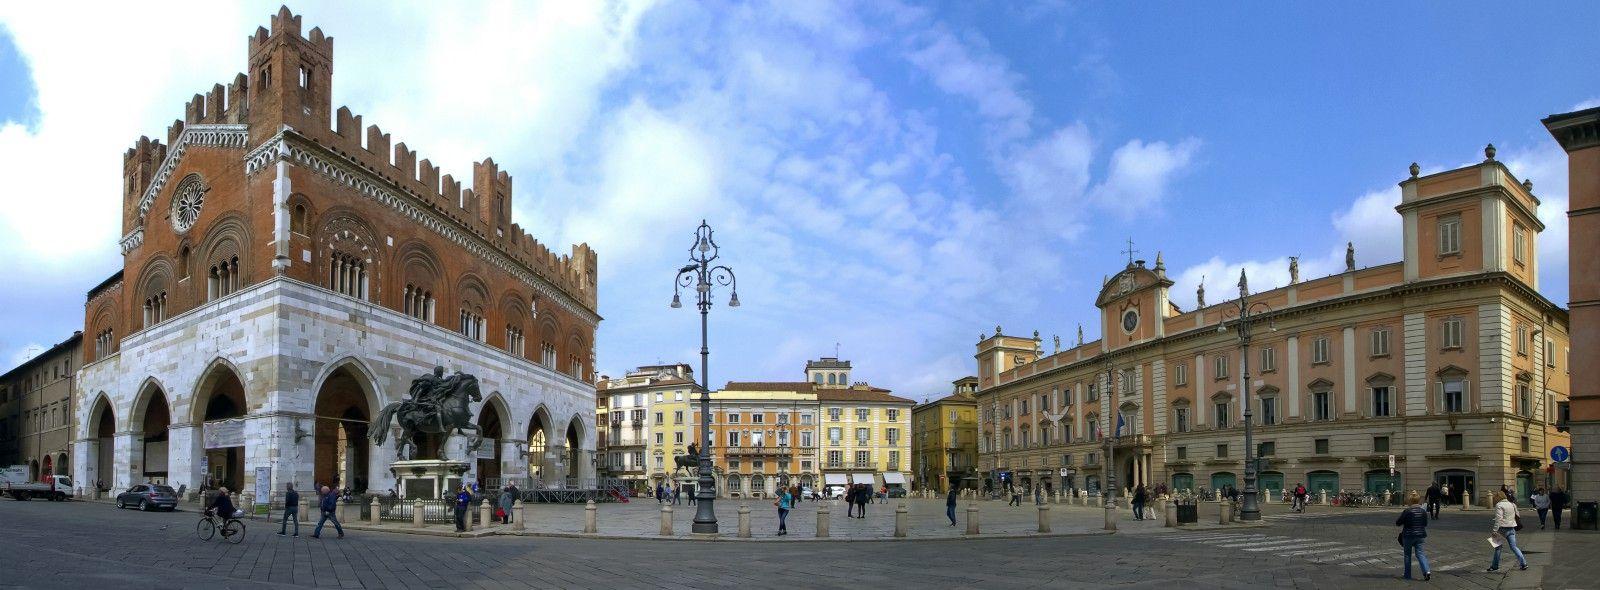 Dove mangiare a Piacenza